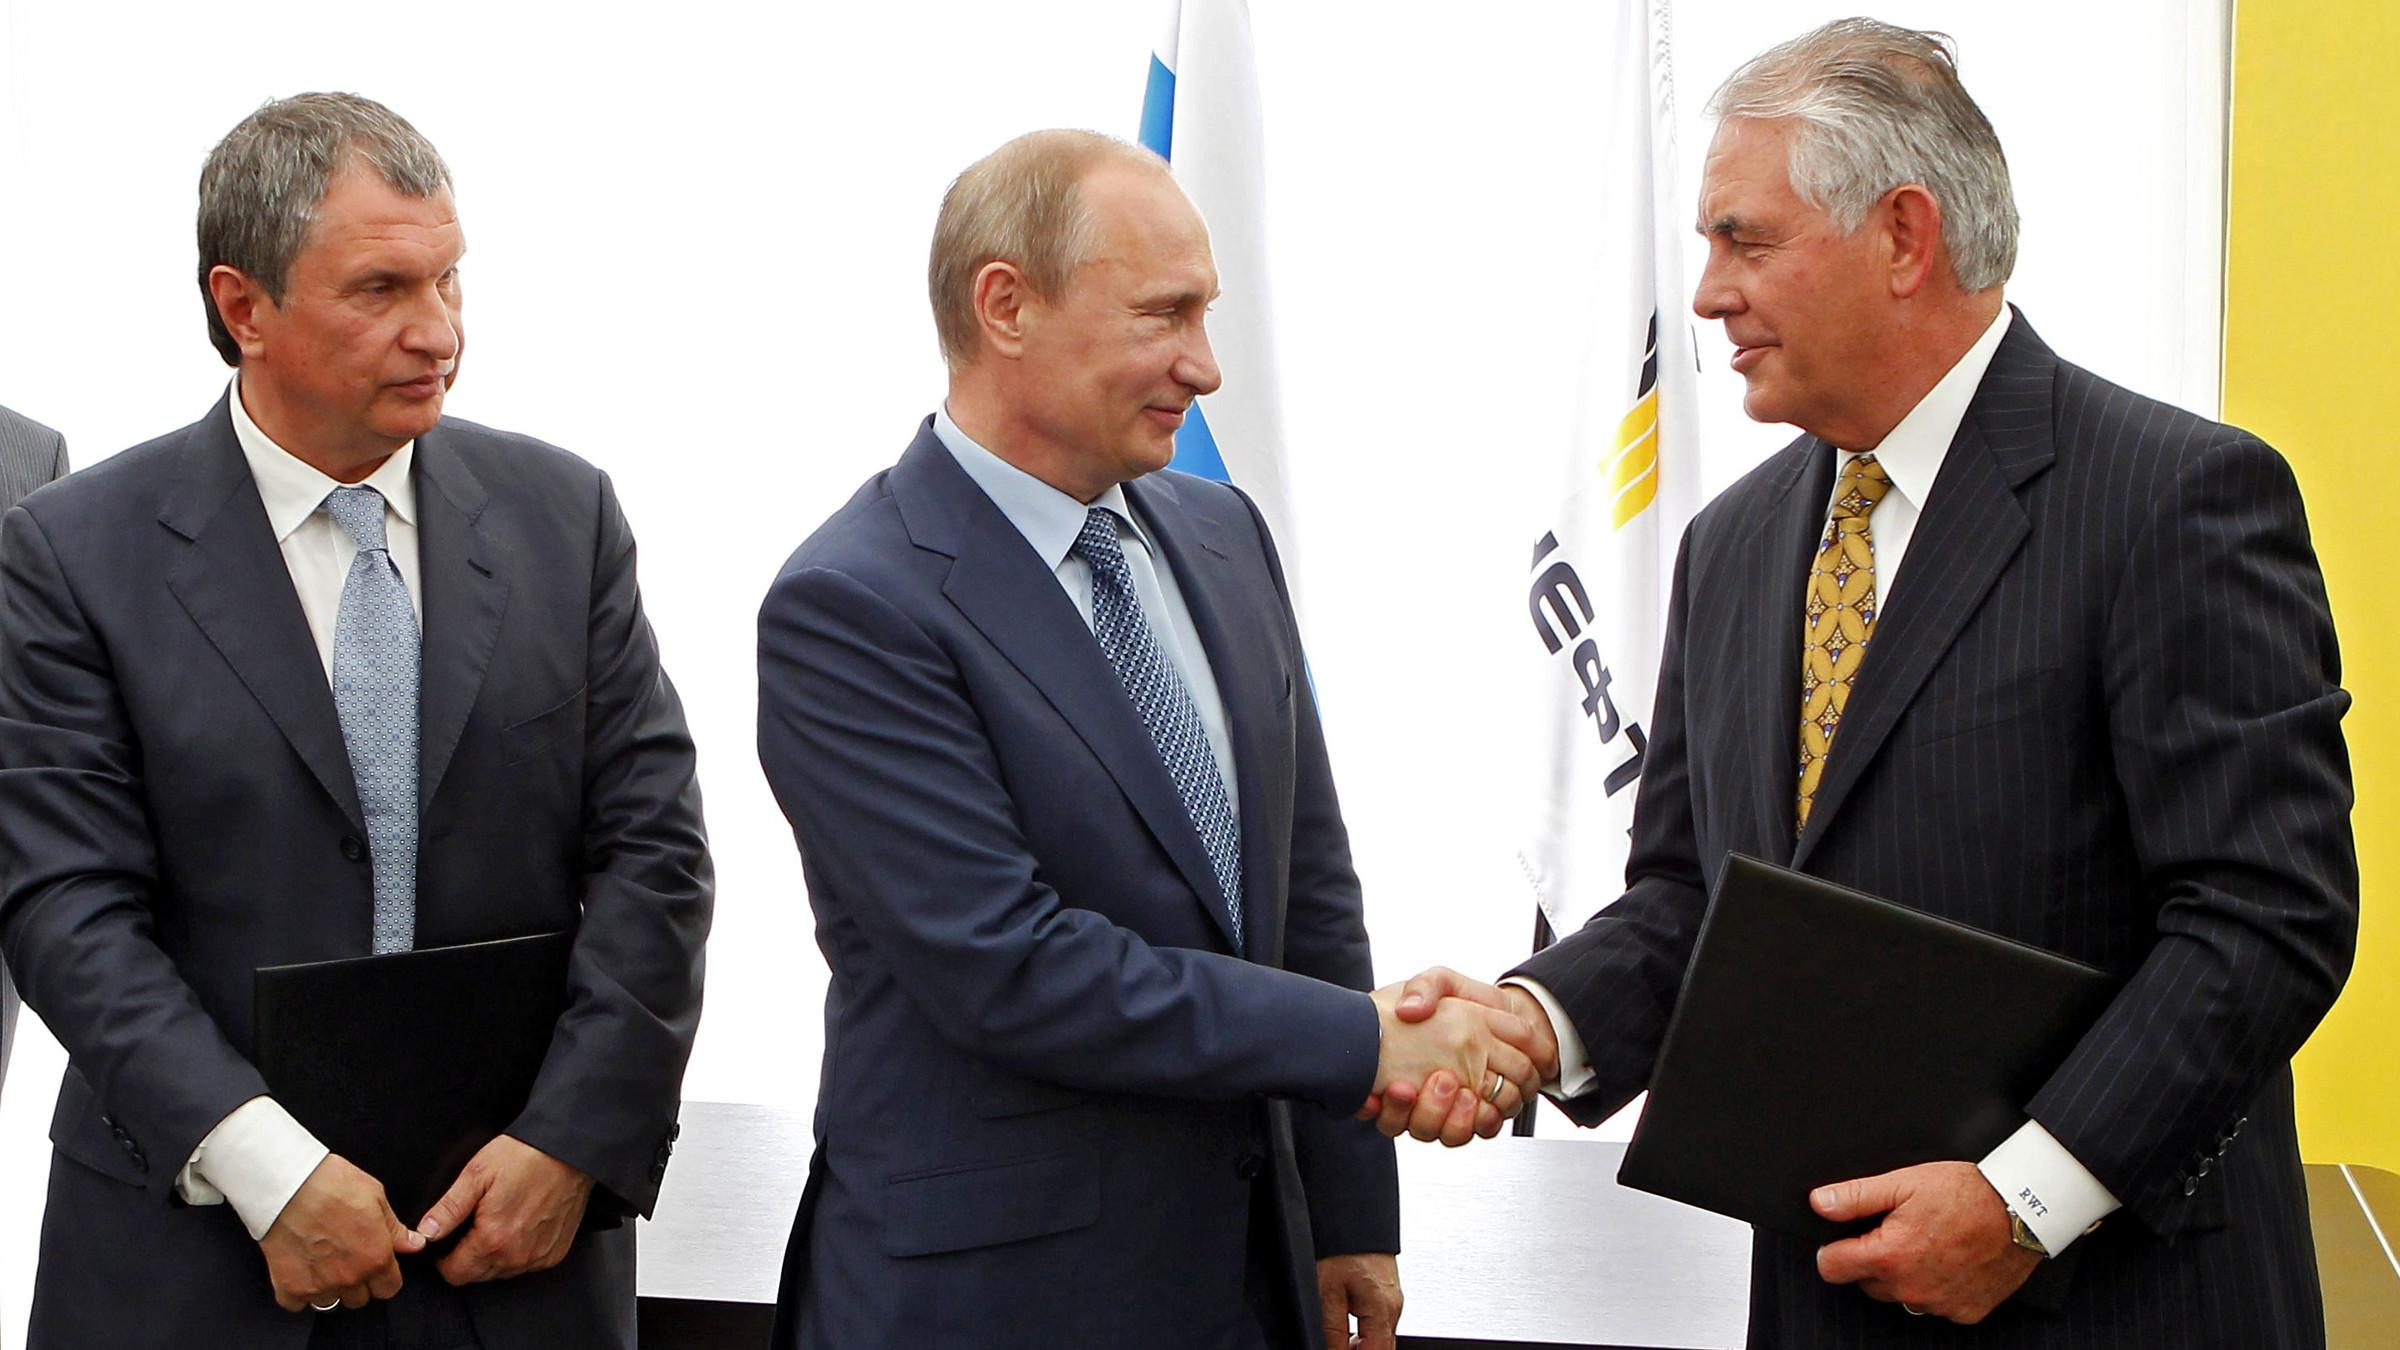 tillerson putin sechin trump sanctions exxon russia jpg?quality=75&strip=all&w=1400.'